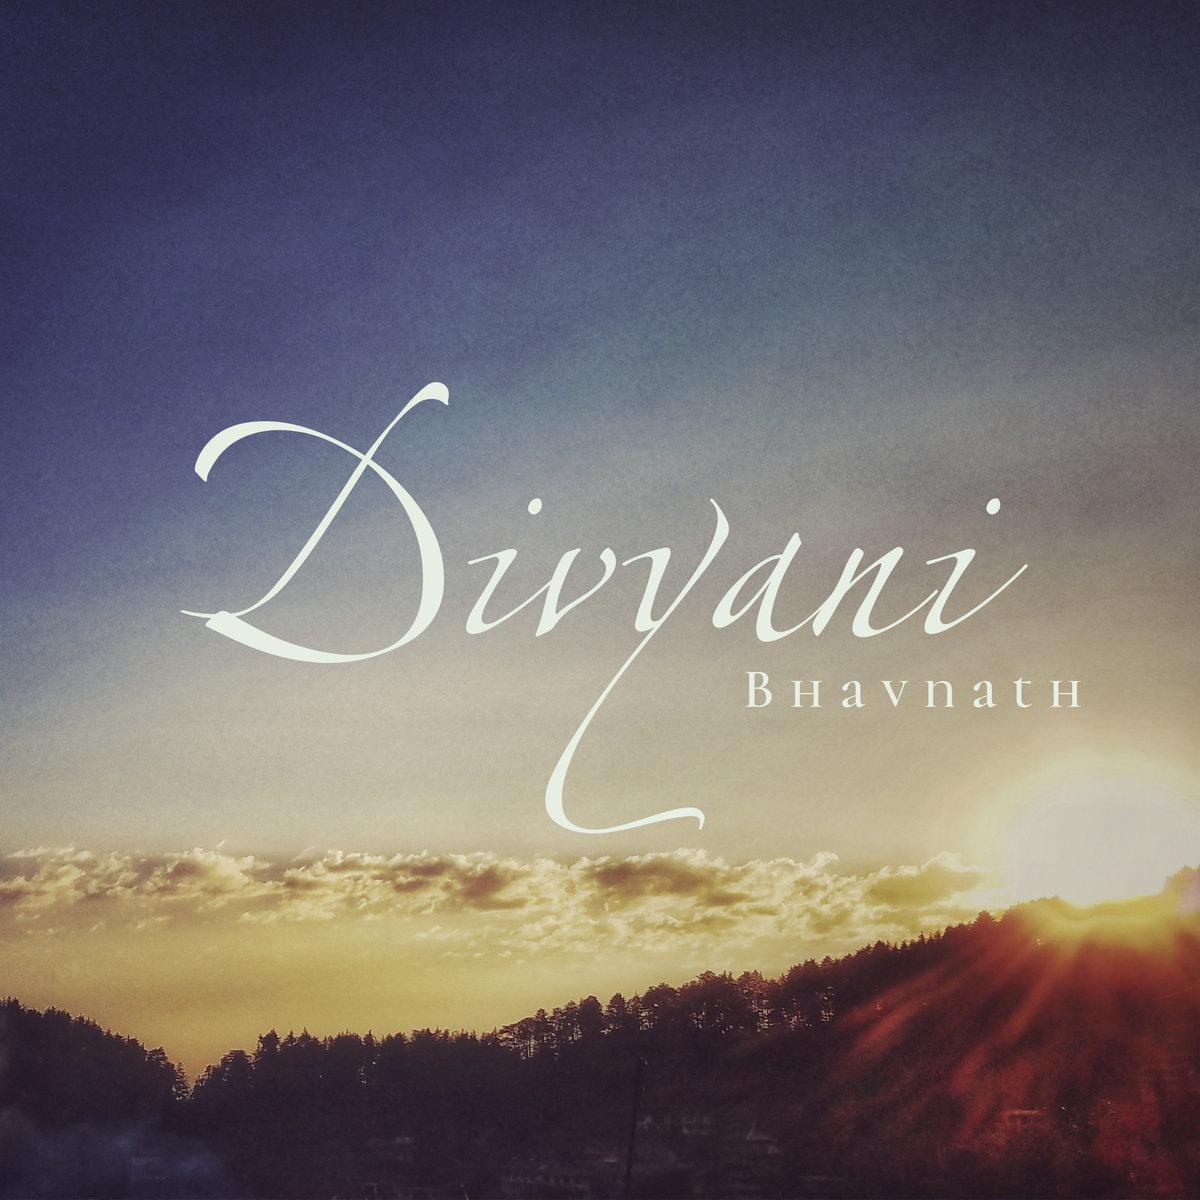 divyani name